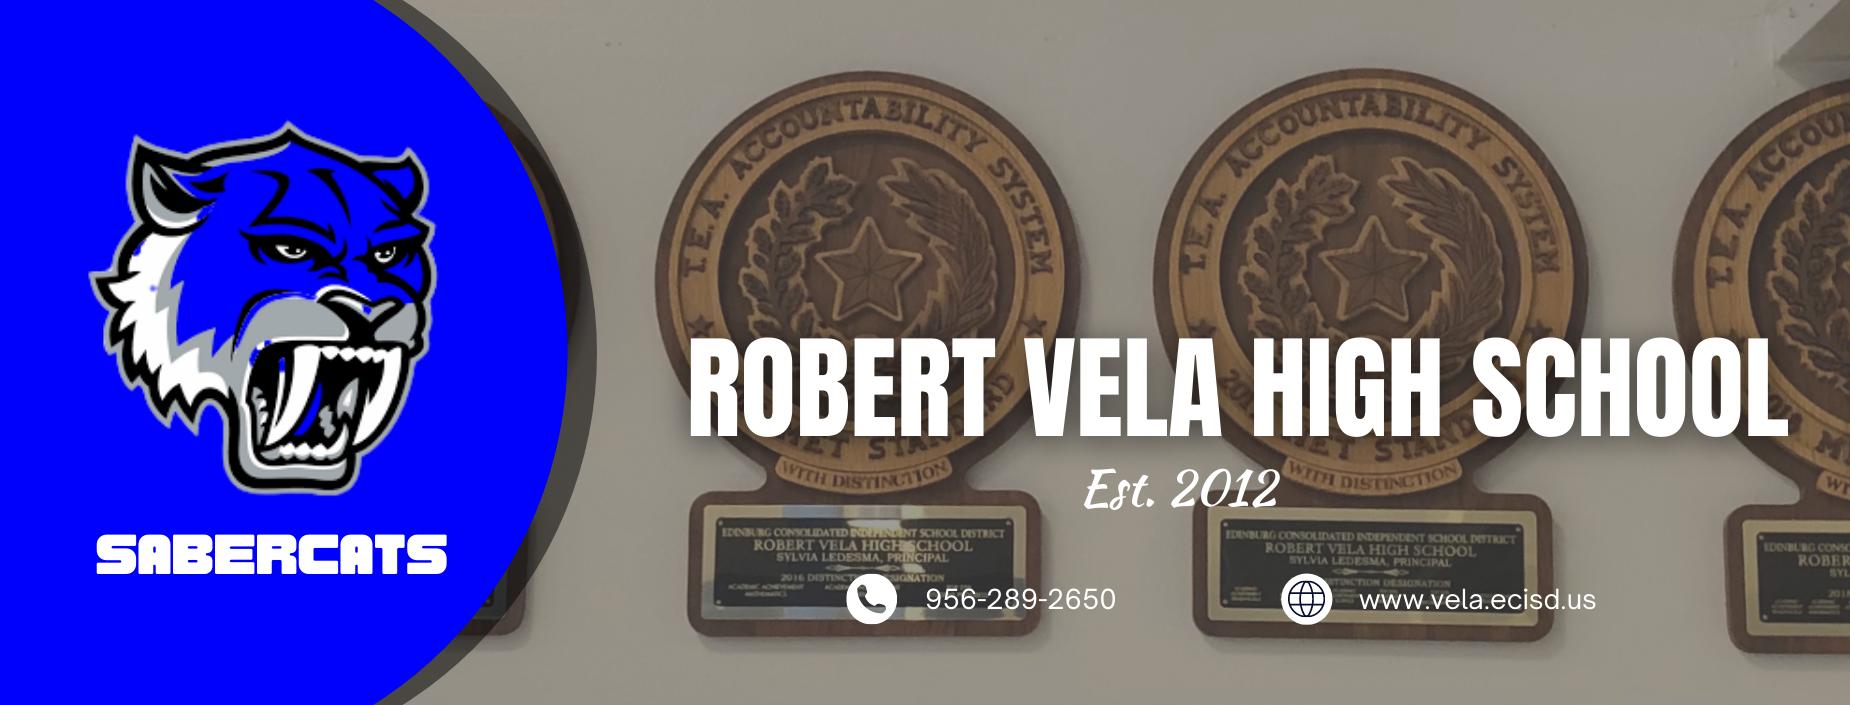 Robert Vela High School